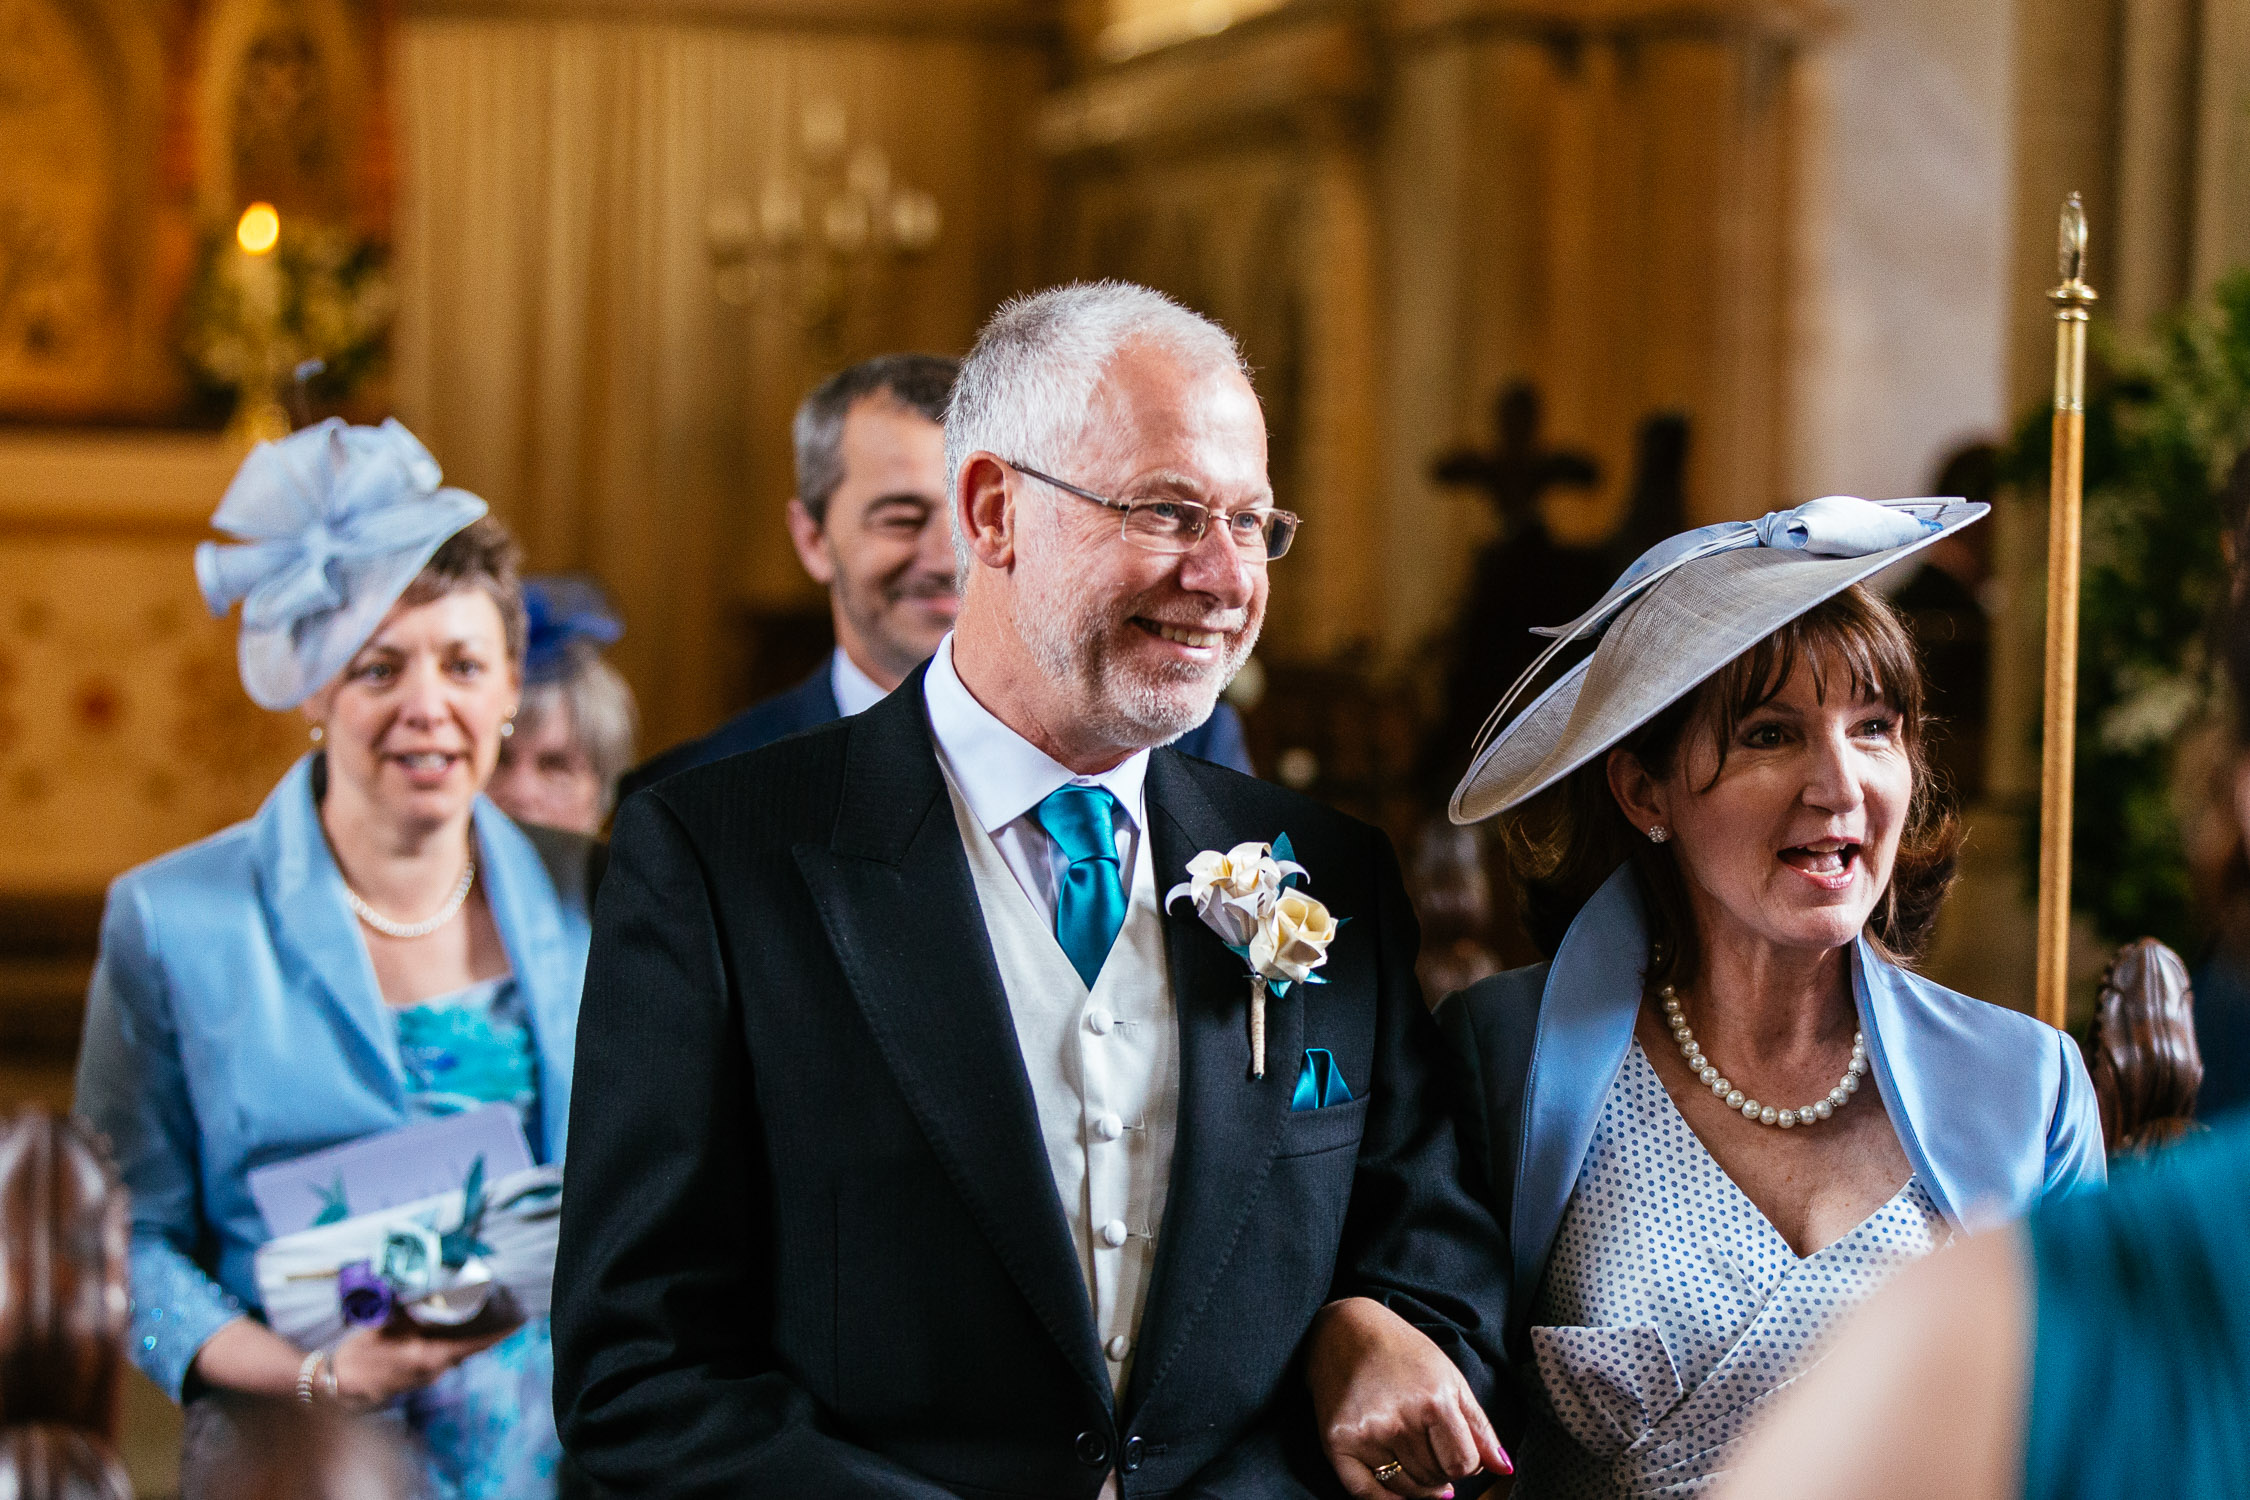 Lizi-and-Mark-Wedding-Highlights-35.jpg